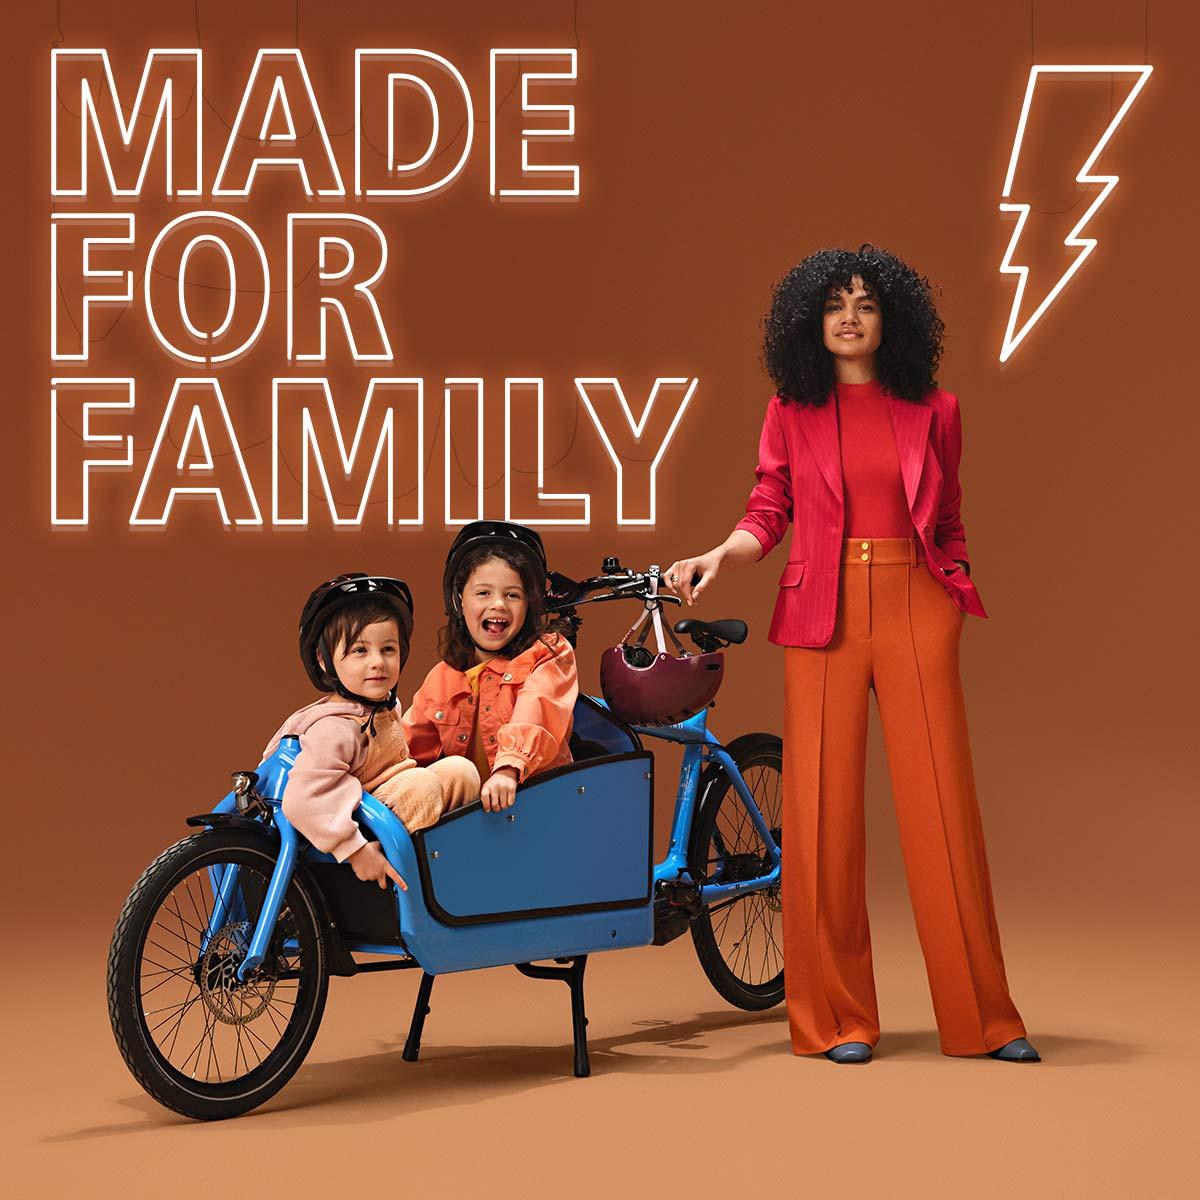 Shimano Cargo e-bikes, heavy-duty electric motor cargo-specific power tunes,made for family